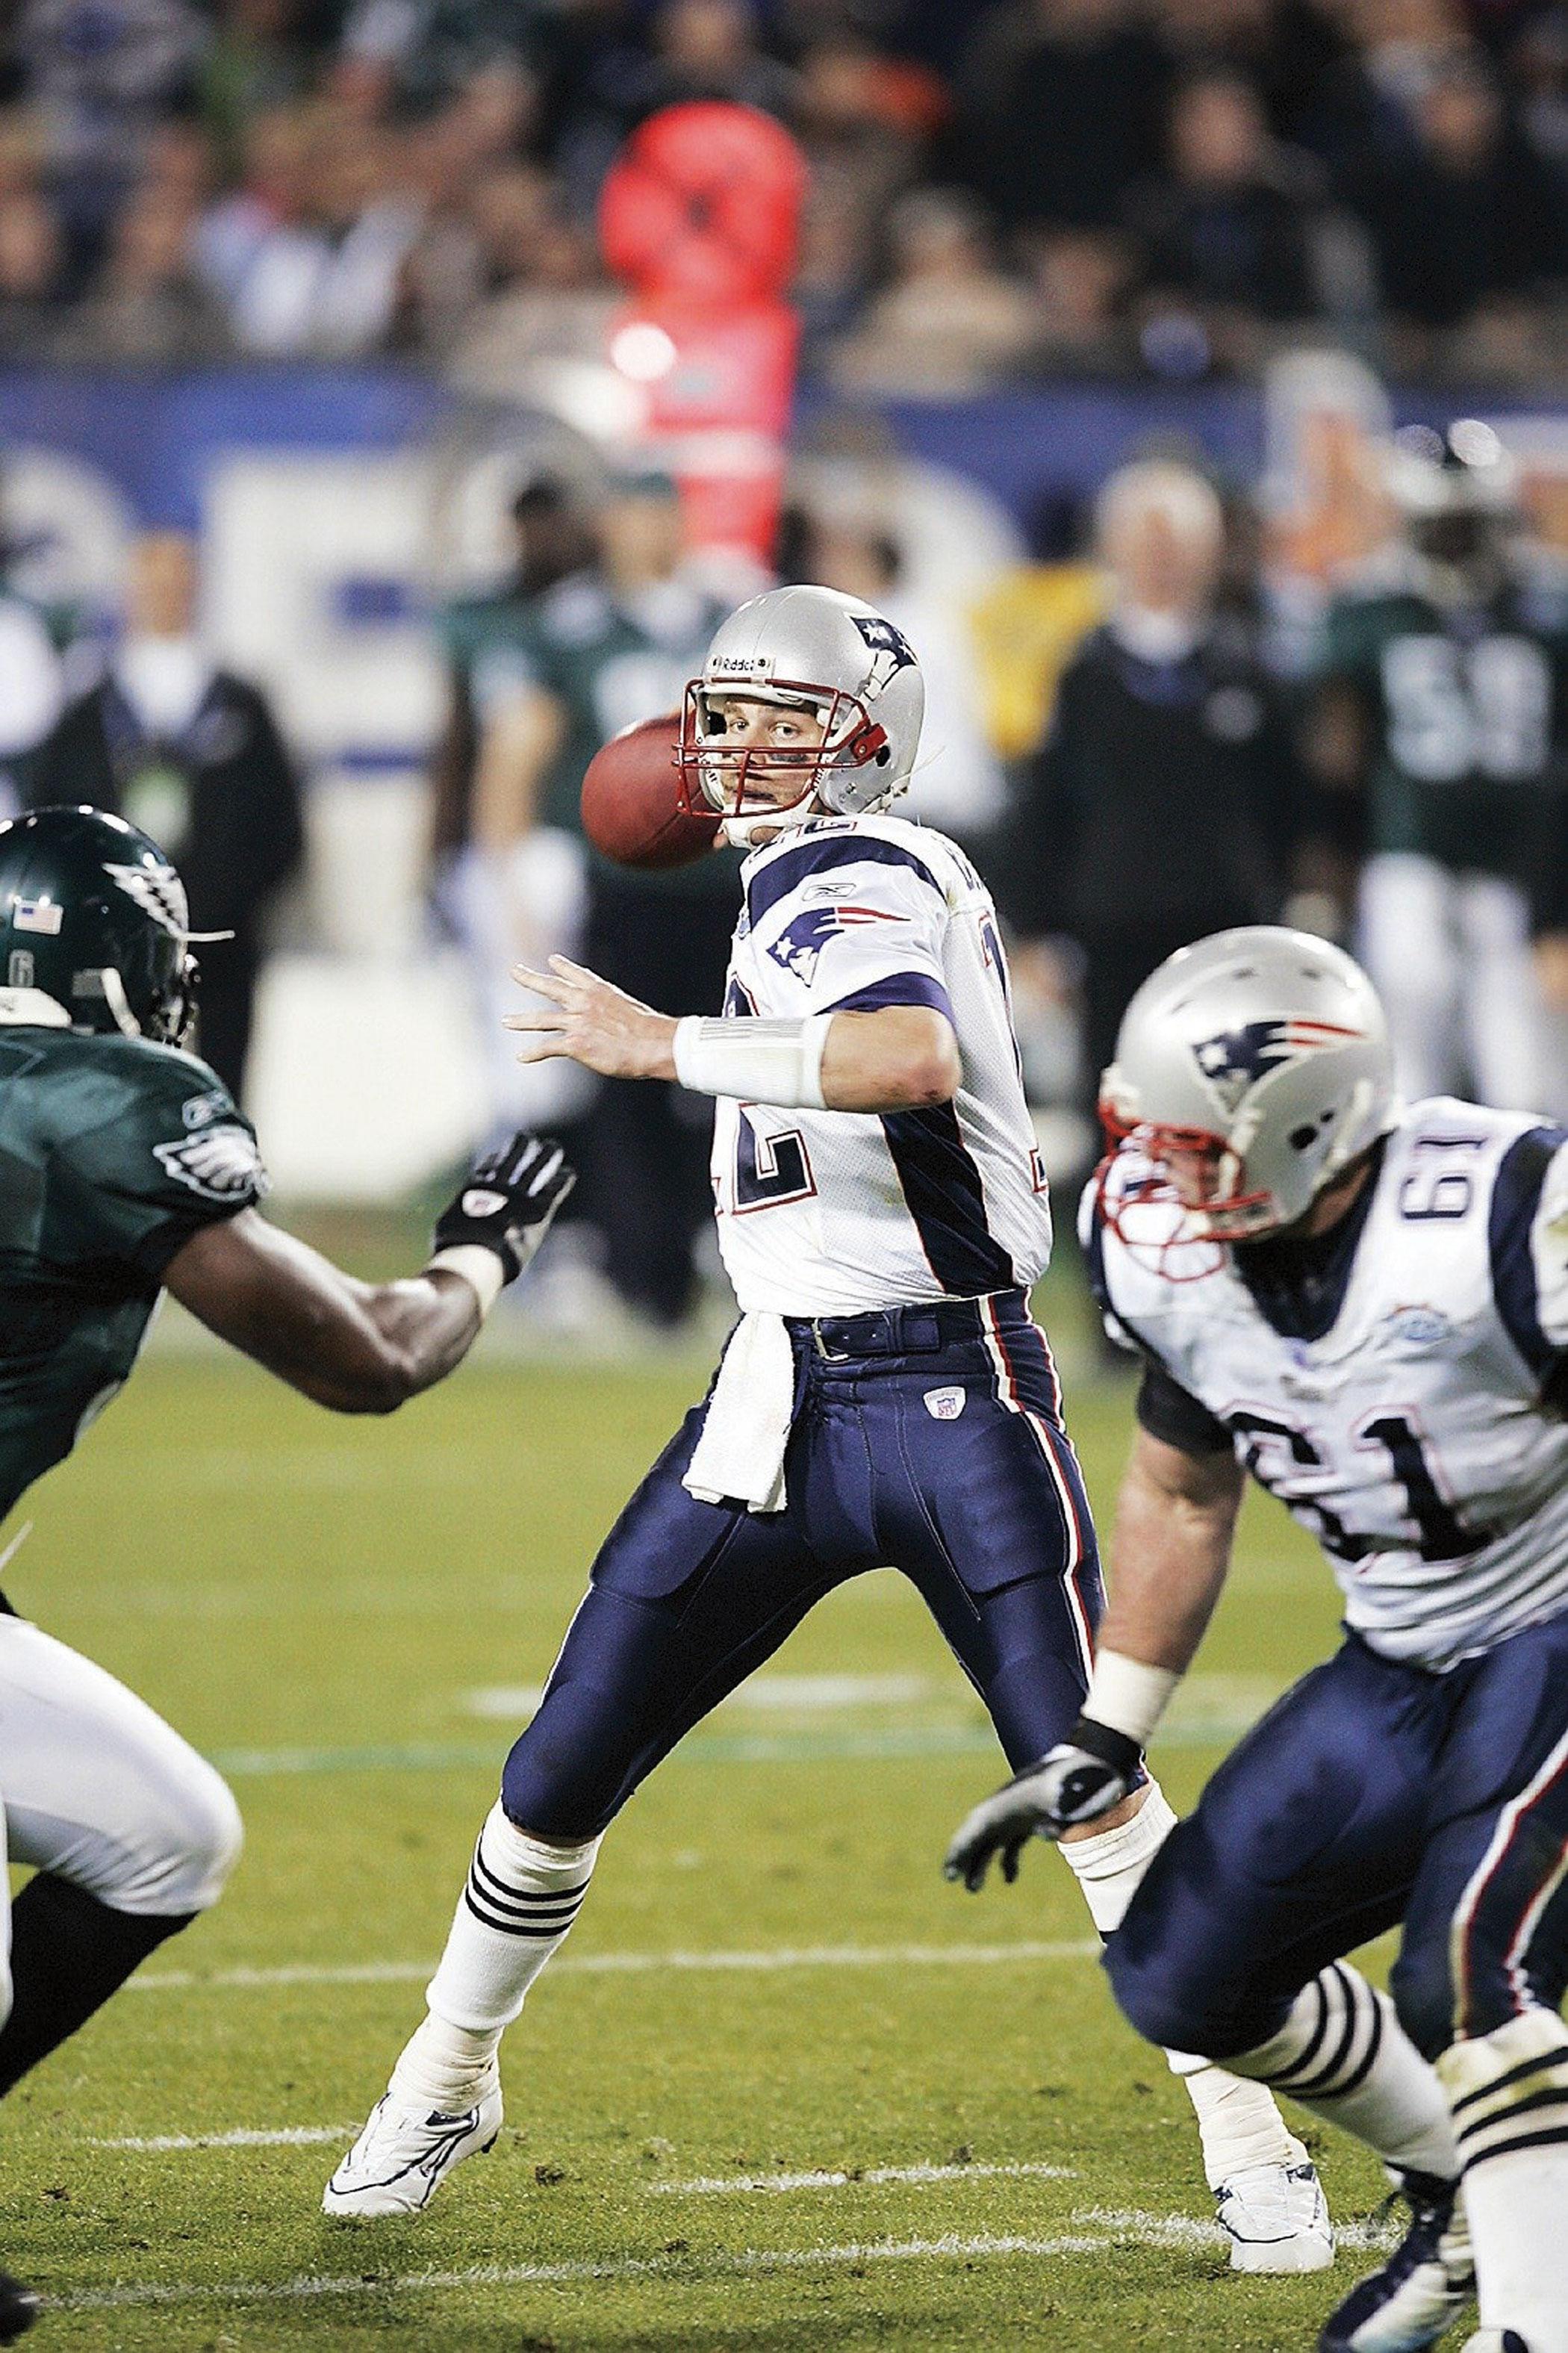 Super Bowl XXXIX, Feb. 6, 2005                               New England Patriots vs Philadelphia Eagles in Jacksonville, Fla.